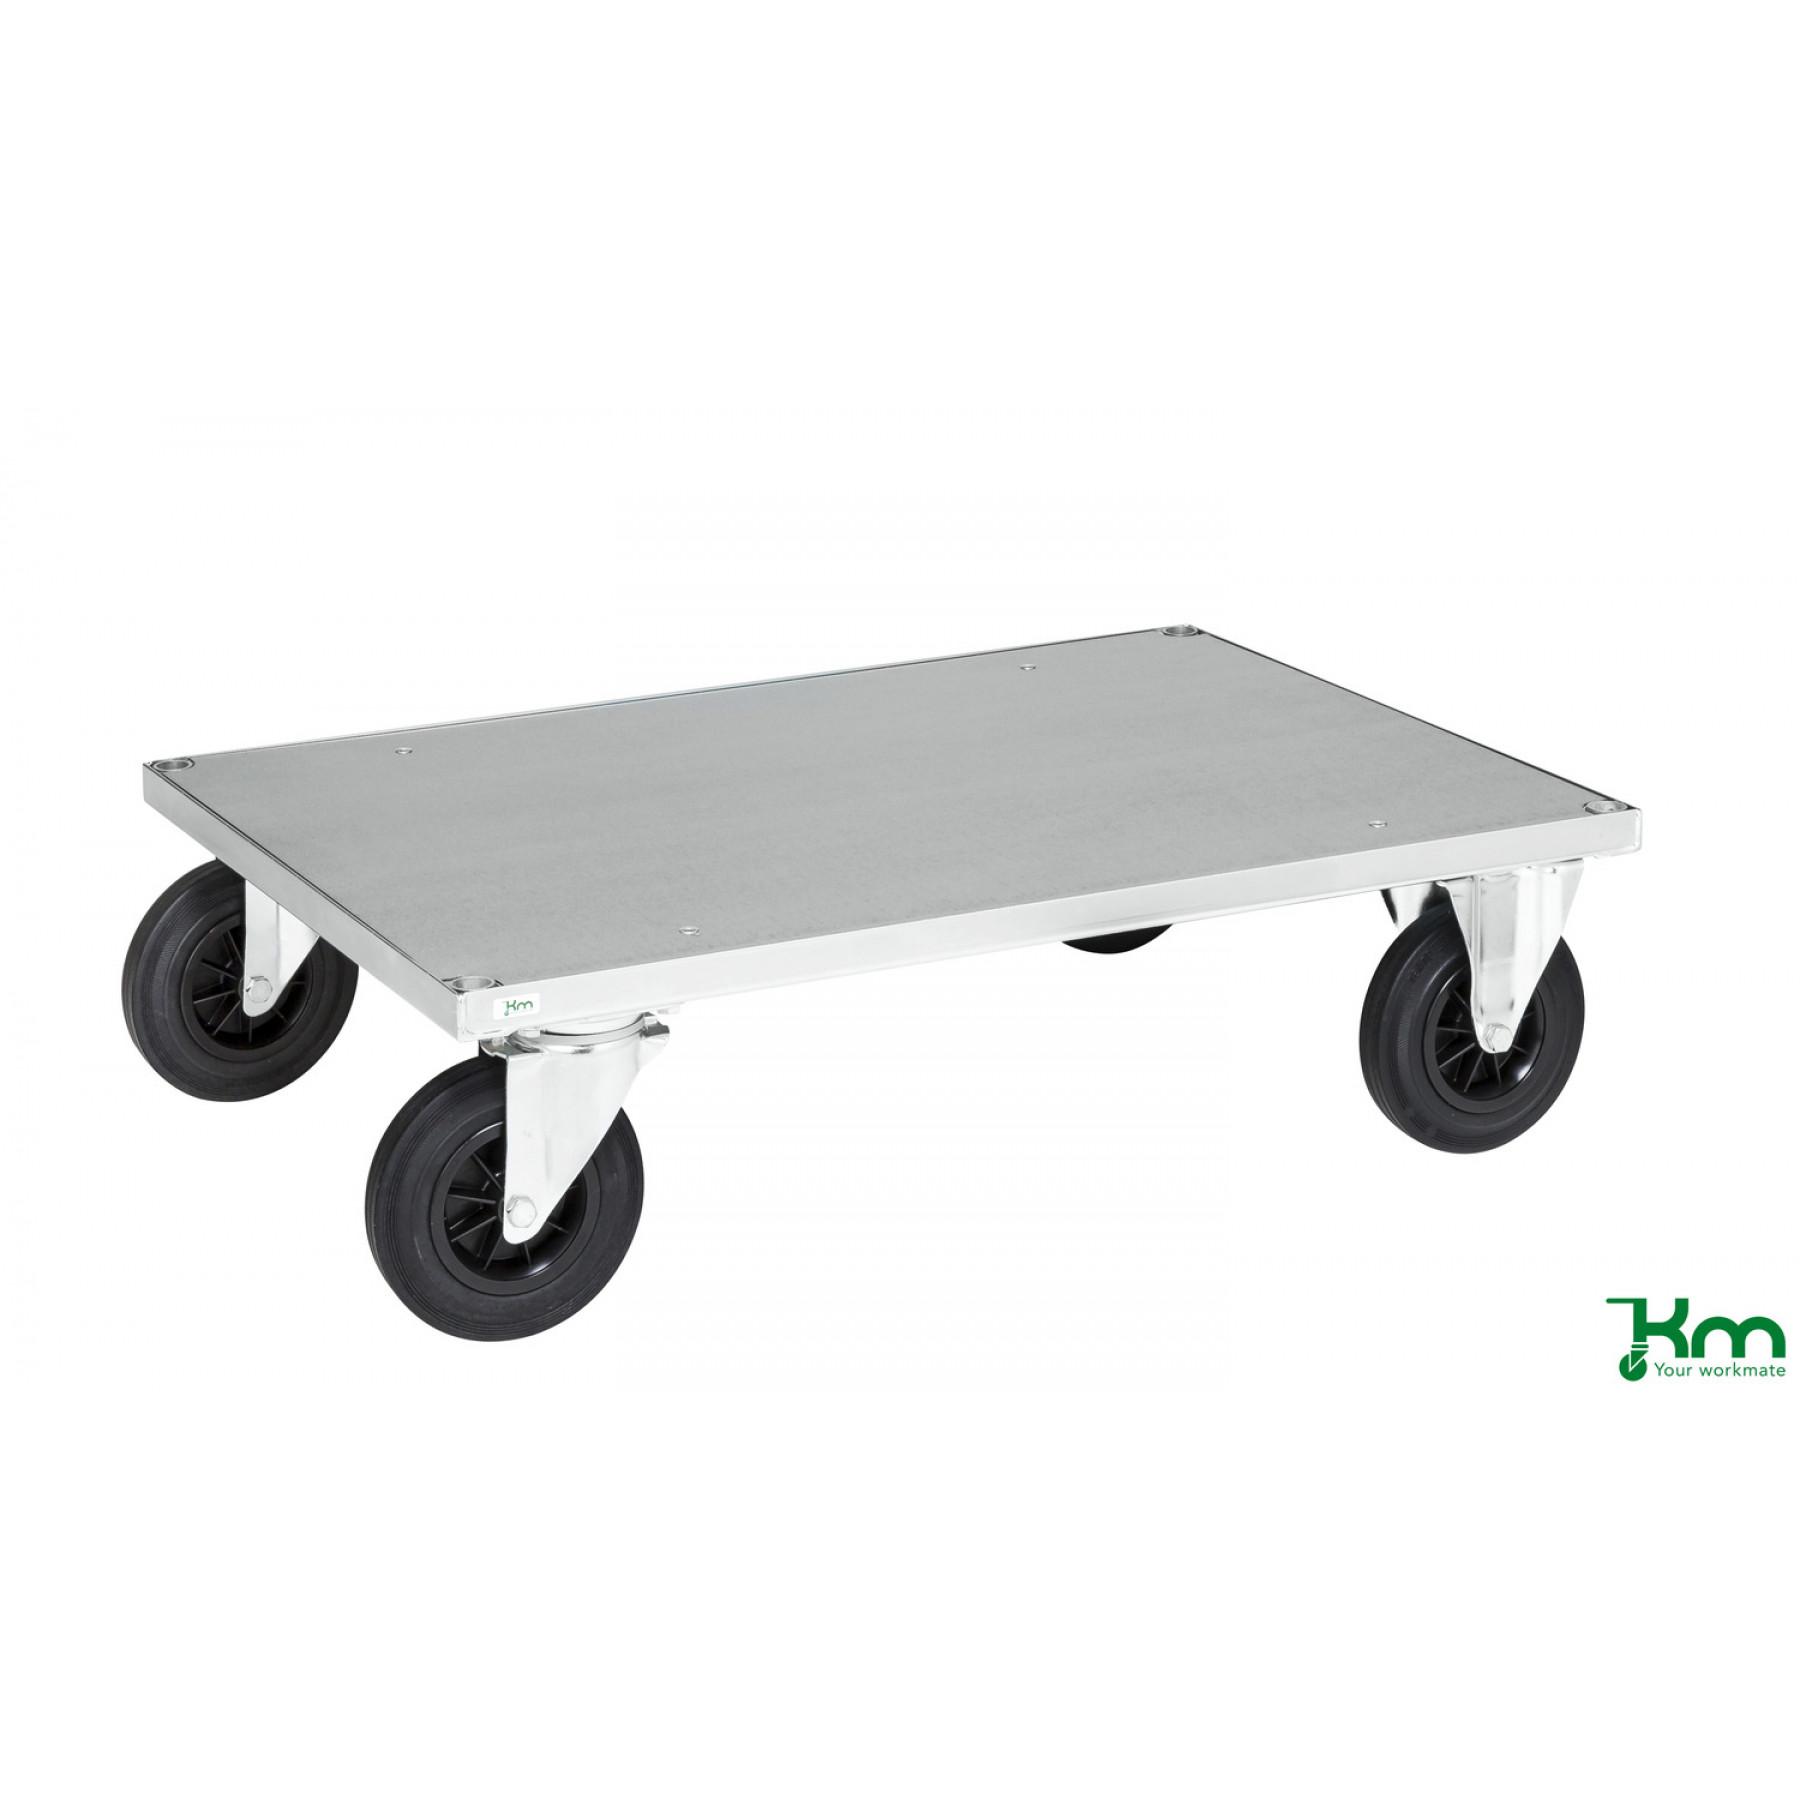 Platformwagen 1200x800 mm, KM 630-3B